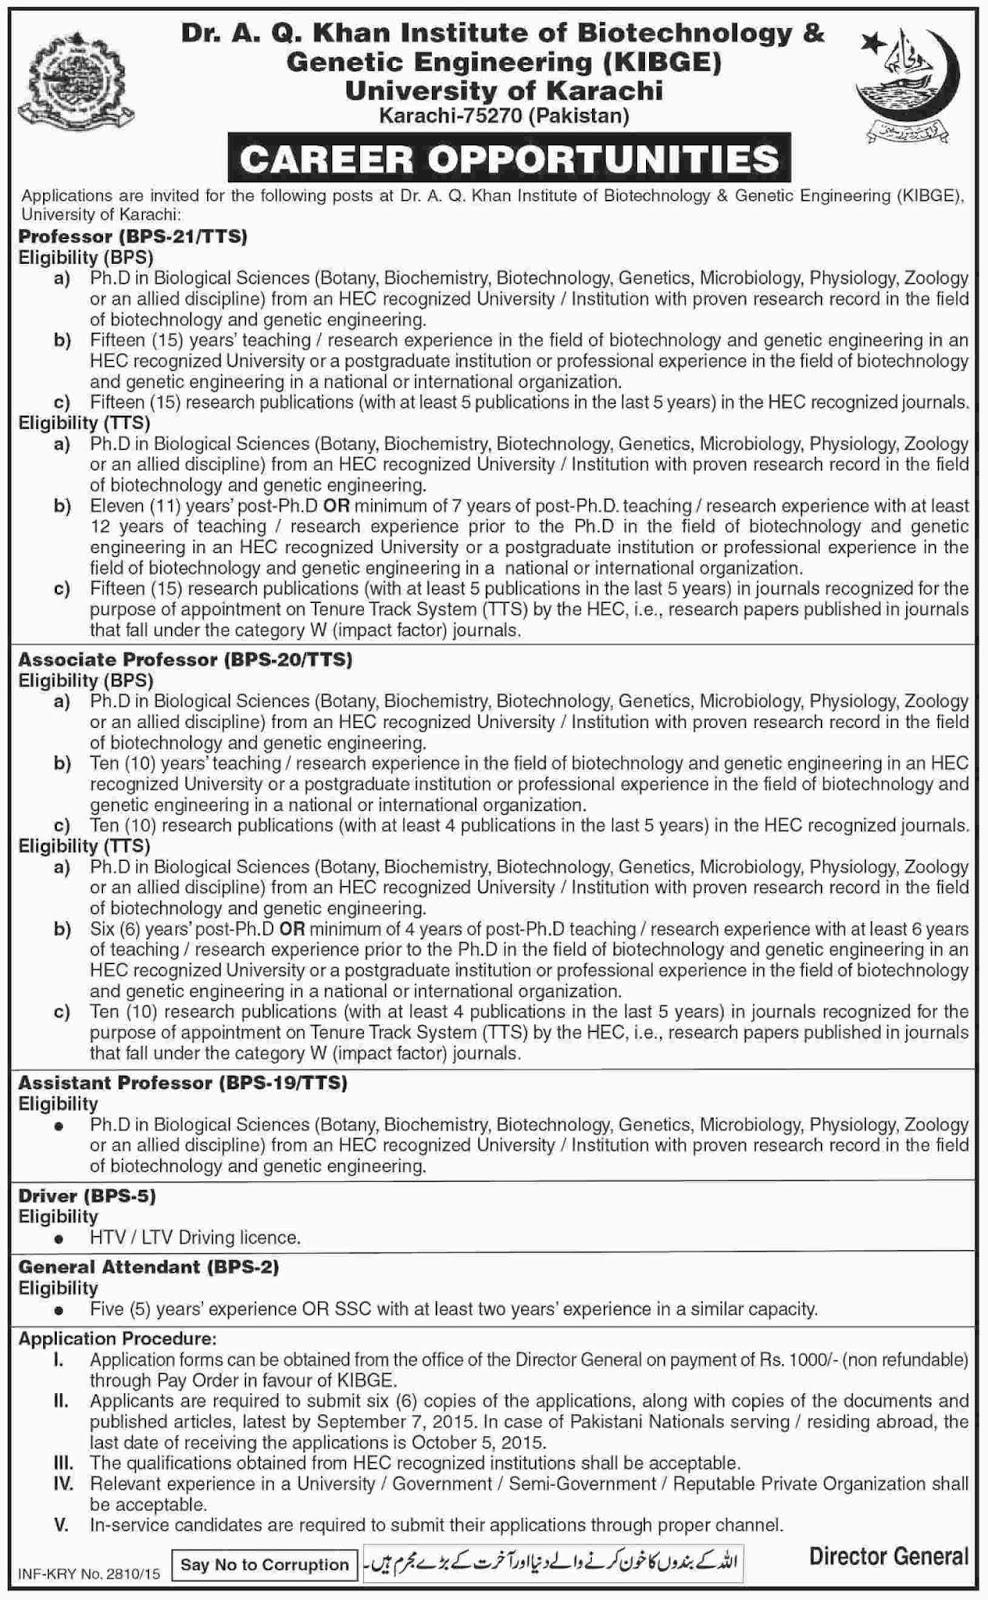 Pec Jobs: Jobs in Dr AQ Khan Institute of Biotechnology